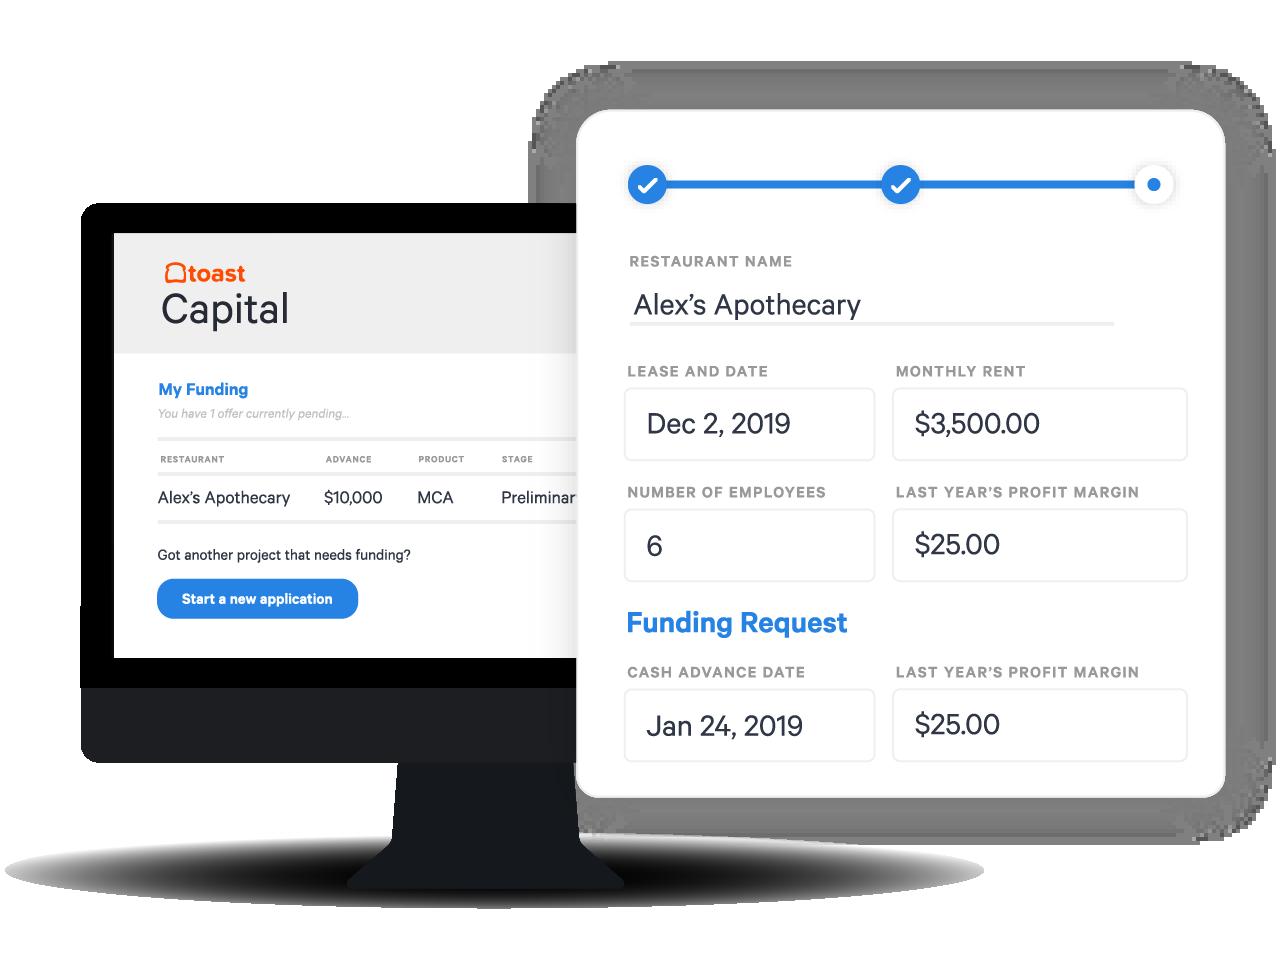 Toast Capital: restaurant financing